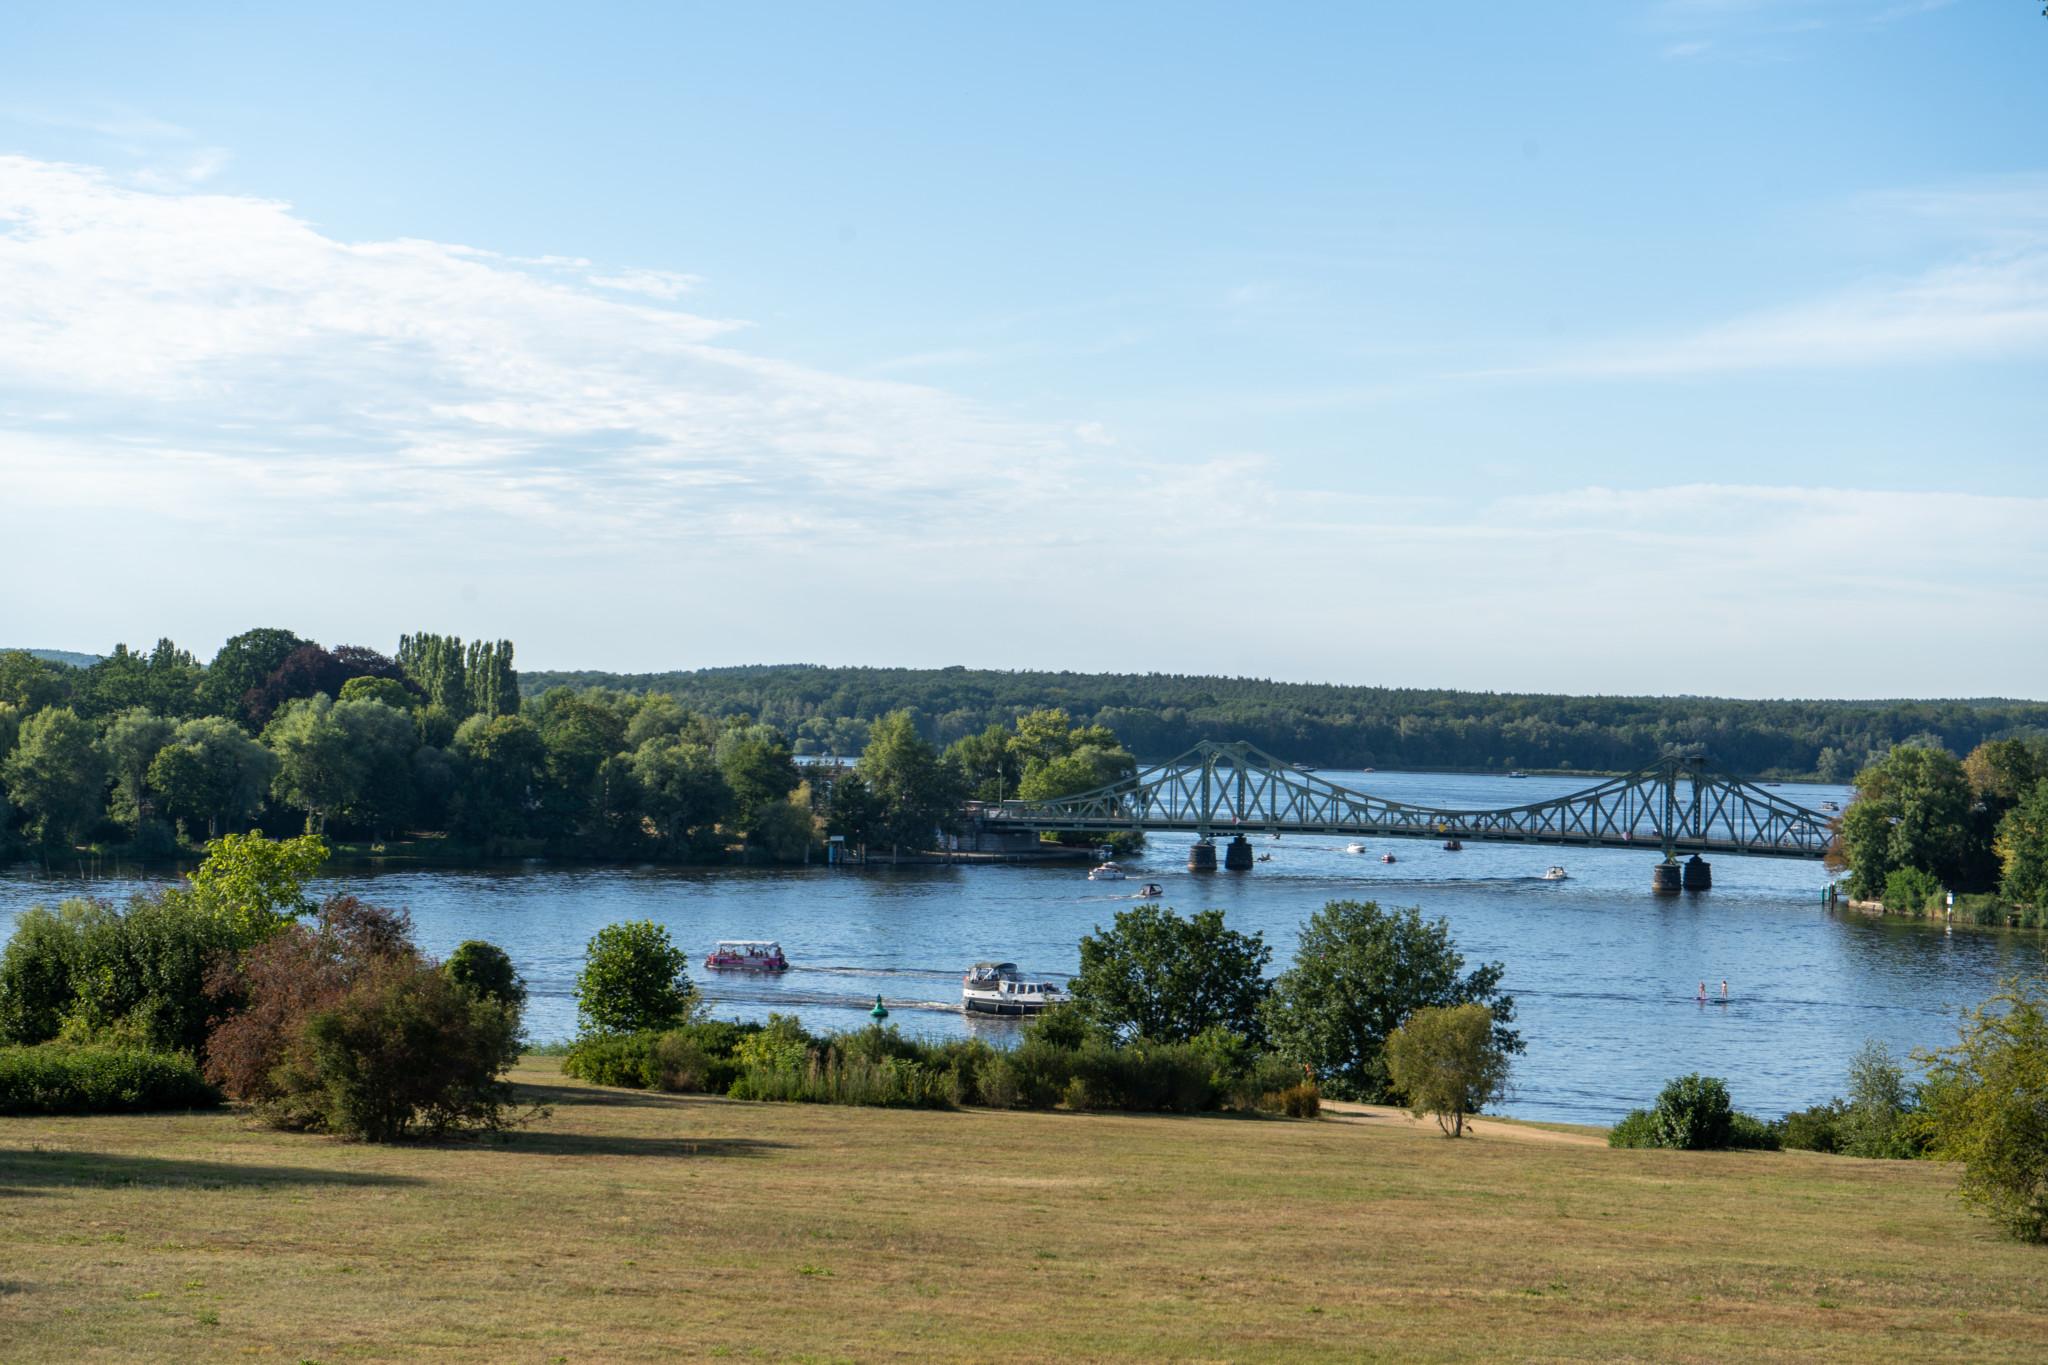 Die berühmte Glienicker Brücke